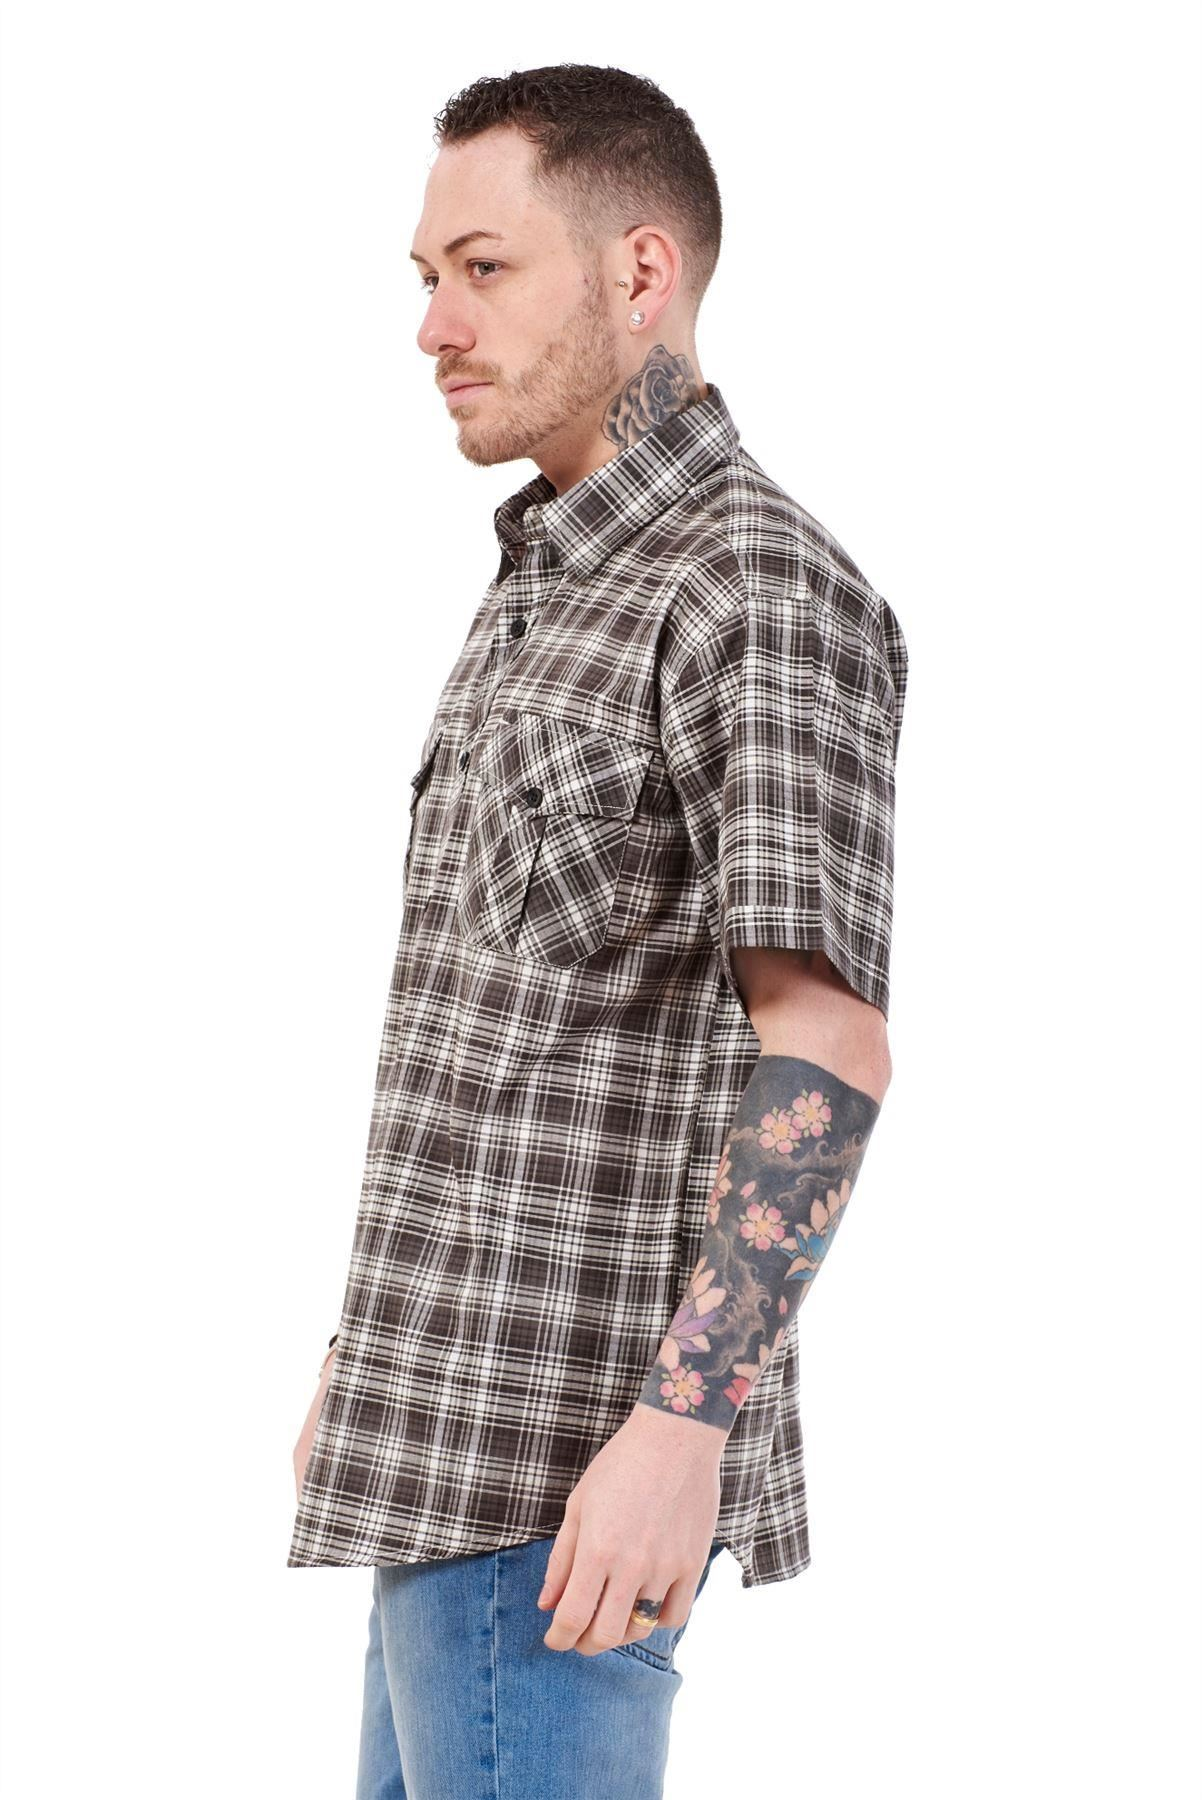 Mens-Regular-Big-Size-Shirts-Checked-Cotton-Blend-Casual-Short-Sleeve-Blue-M-5XL thumbnail 3